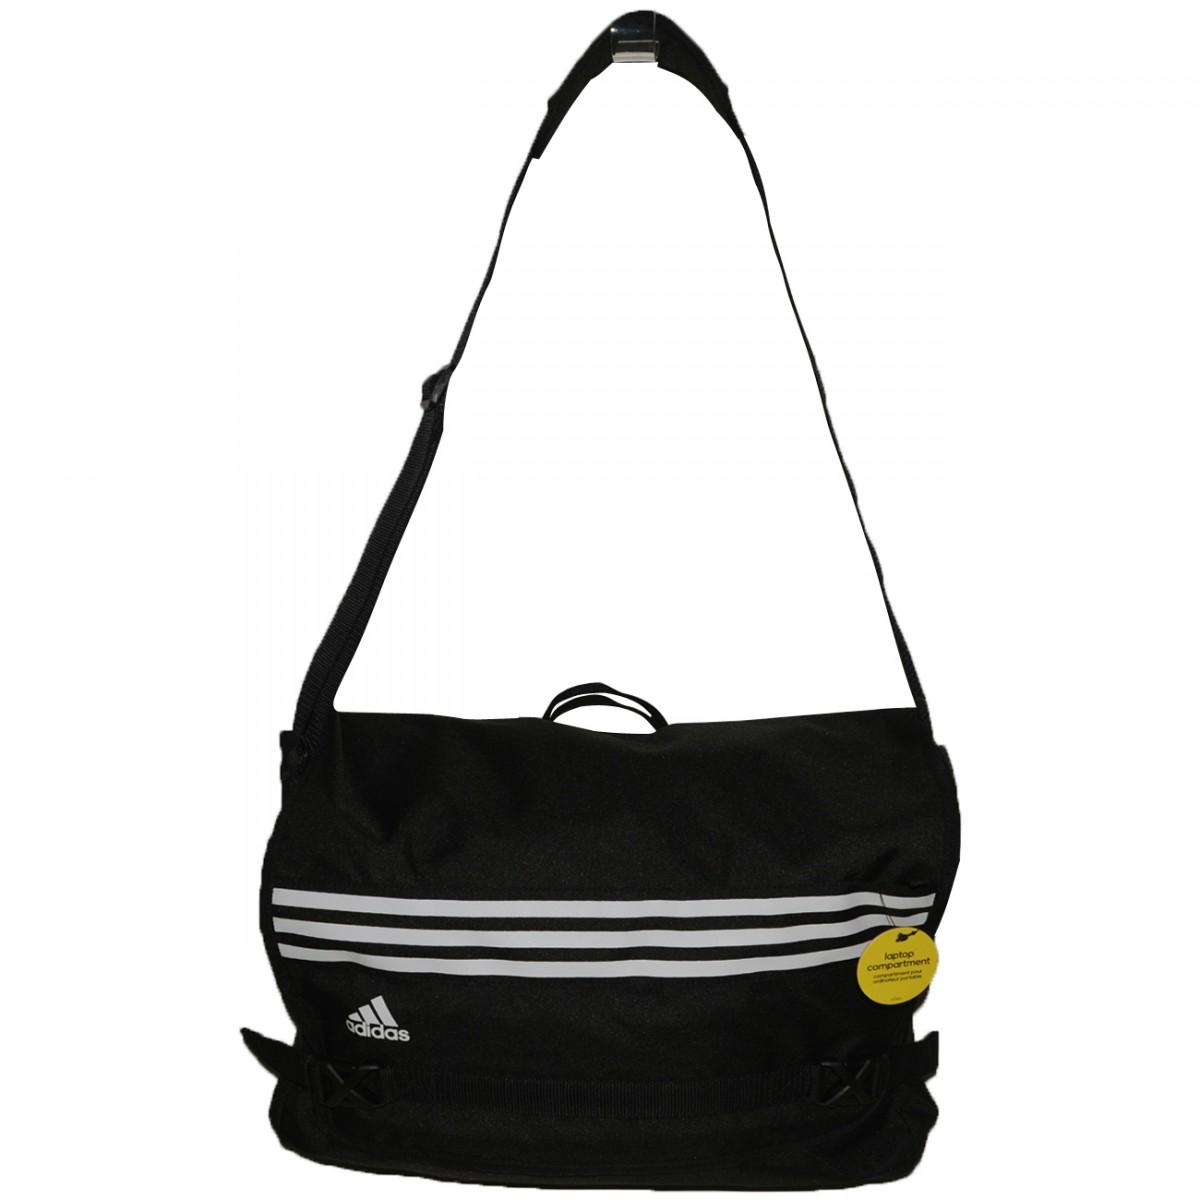 7cb2afd88 Bolsa Adidas ASM AB1866 - Preto/Branco - Chuteira Nike, Adidas. Sandalias  Femininas. Sandy Calçados